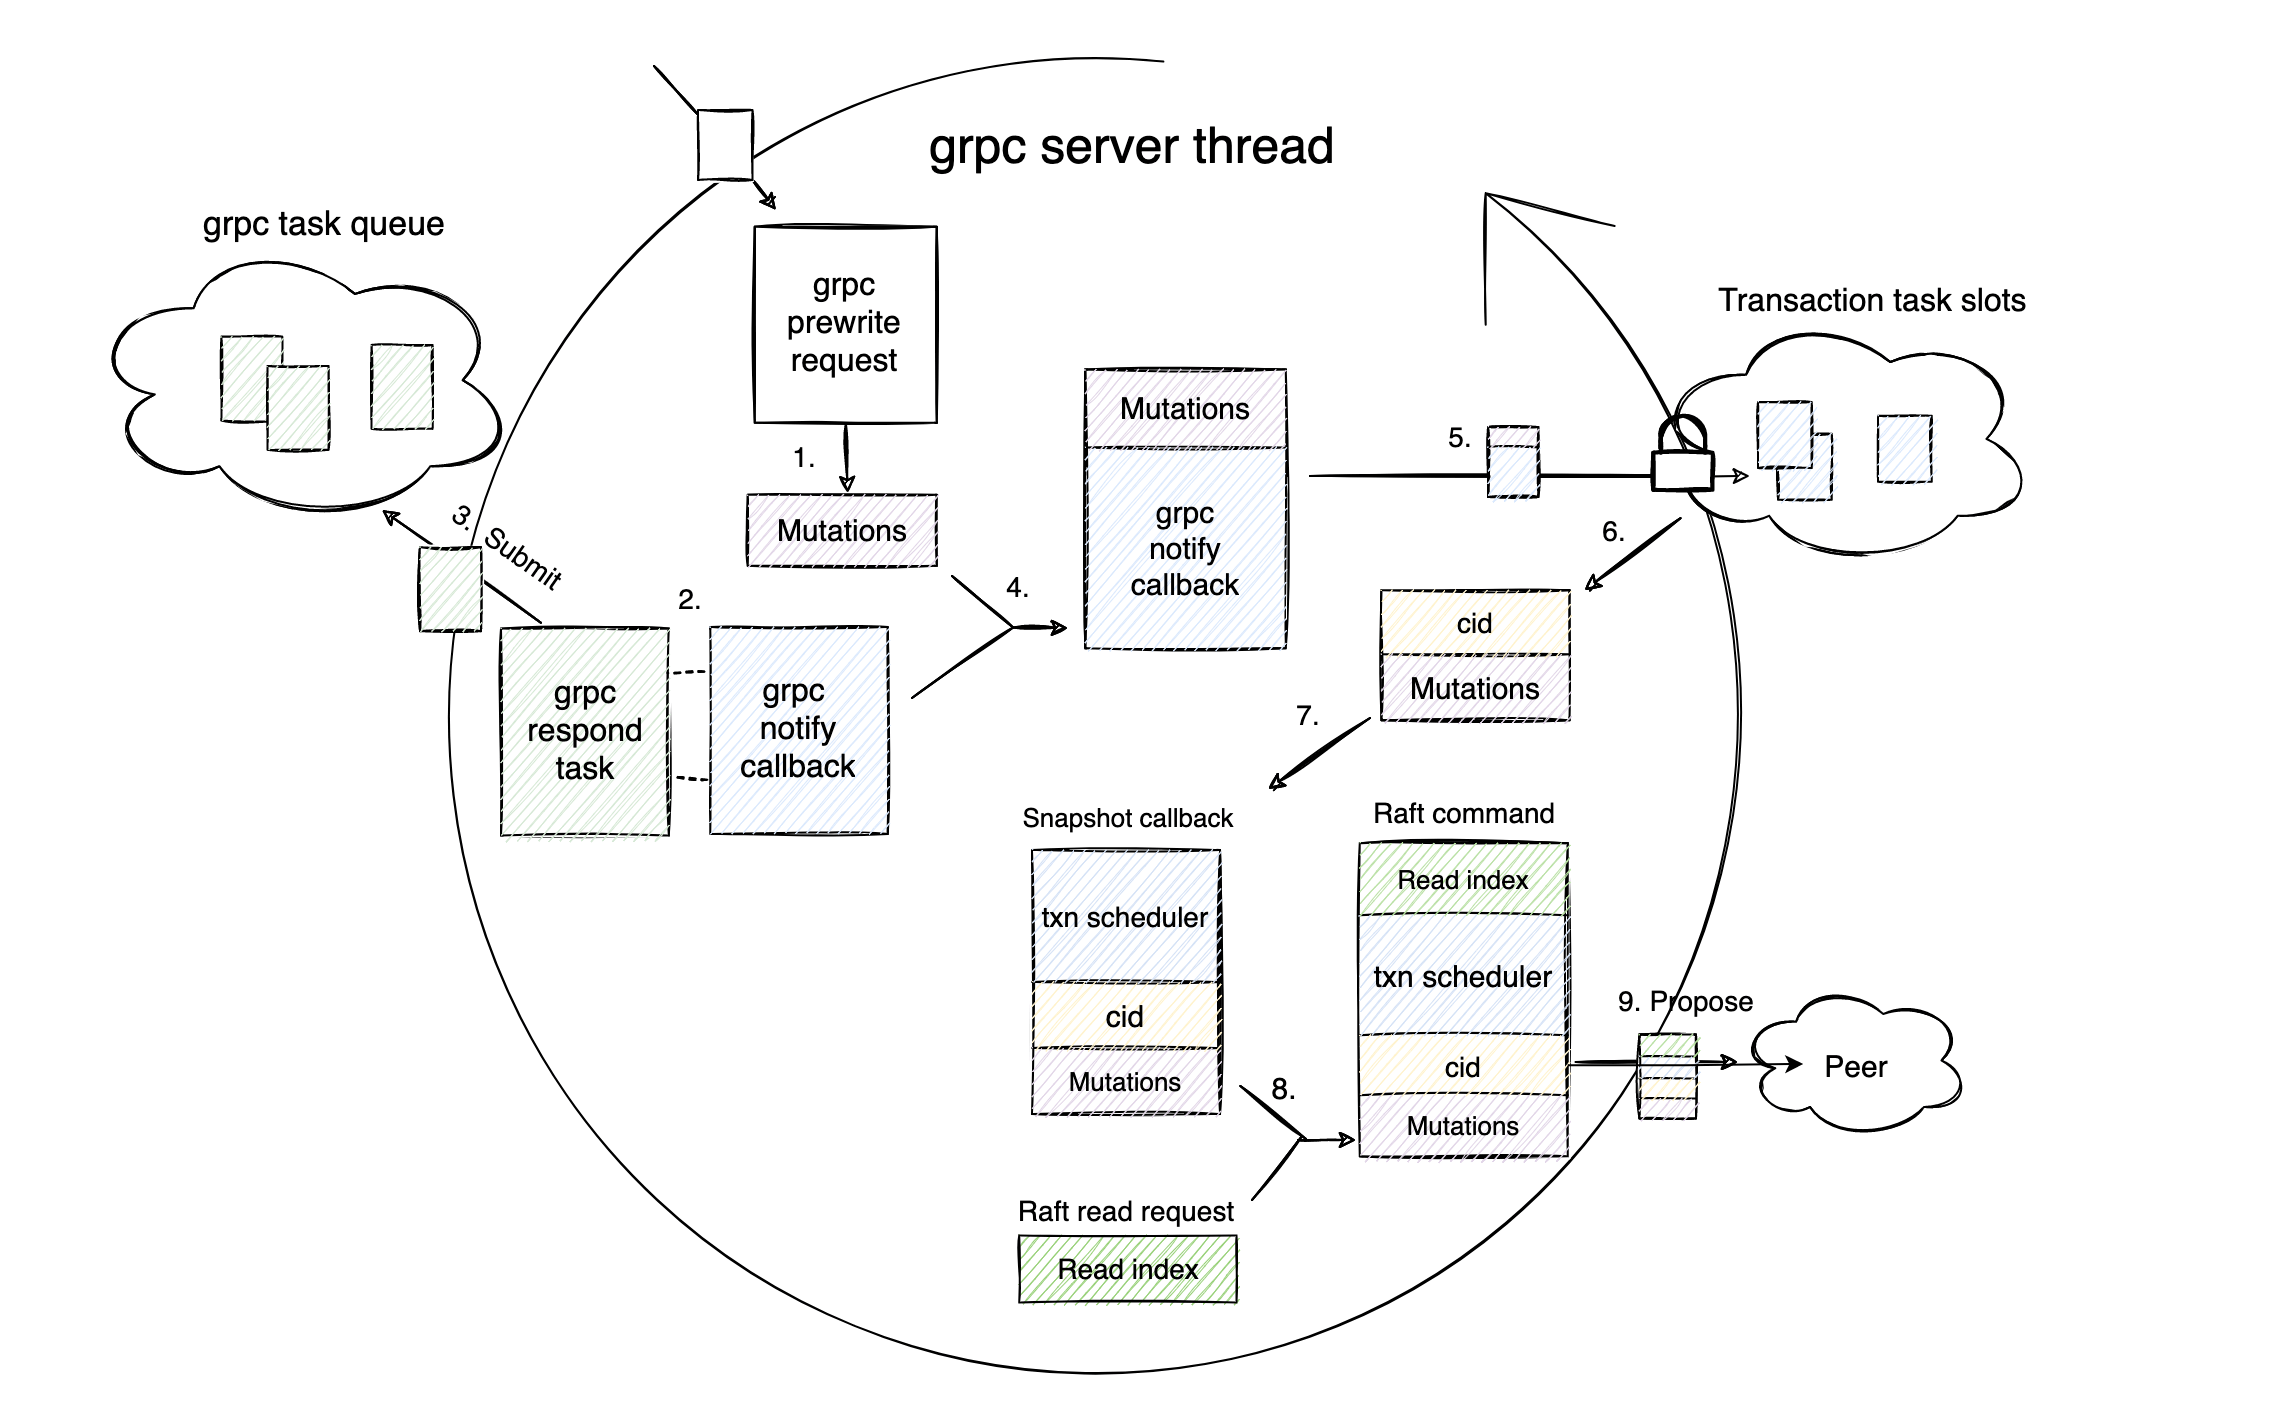 gRPC server thread workflow